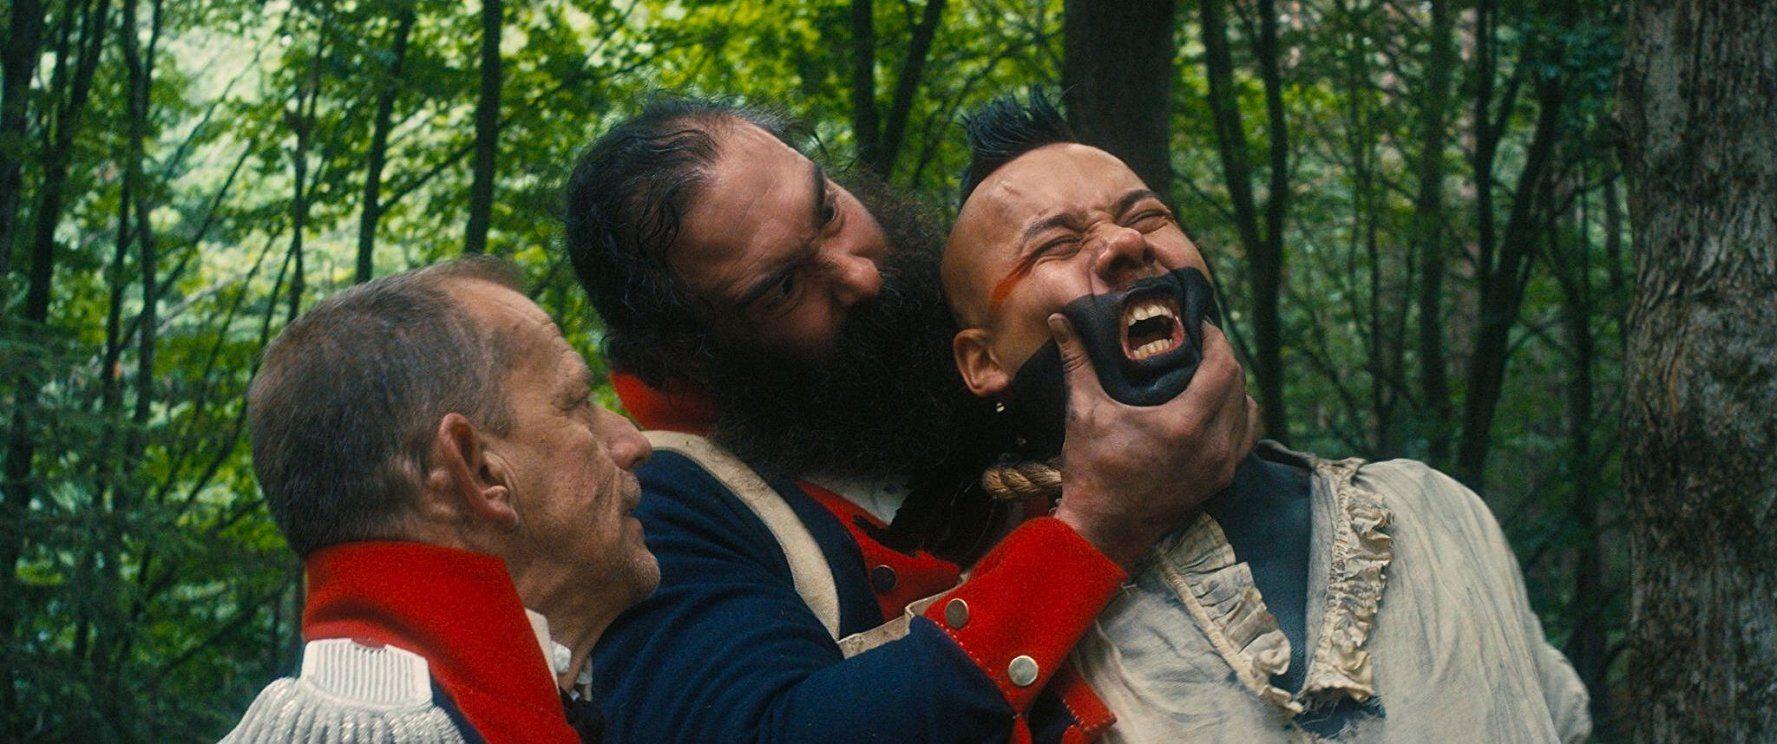 Mohawk Film